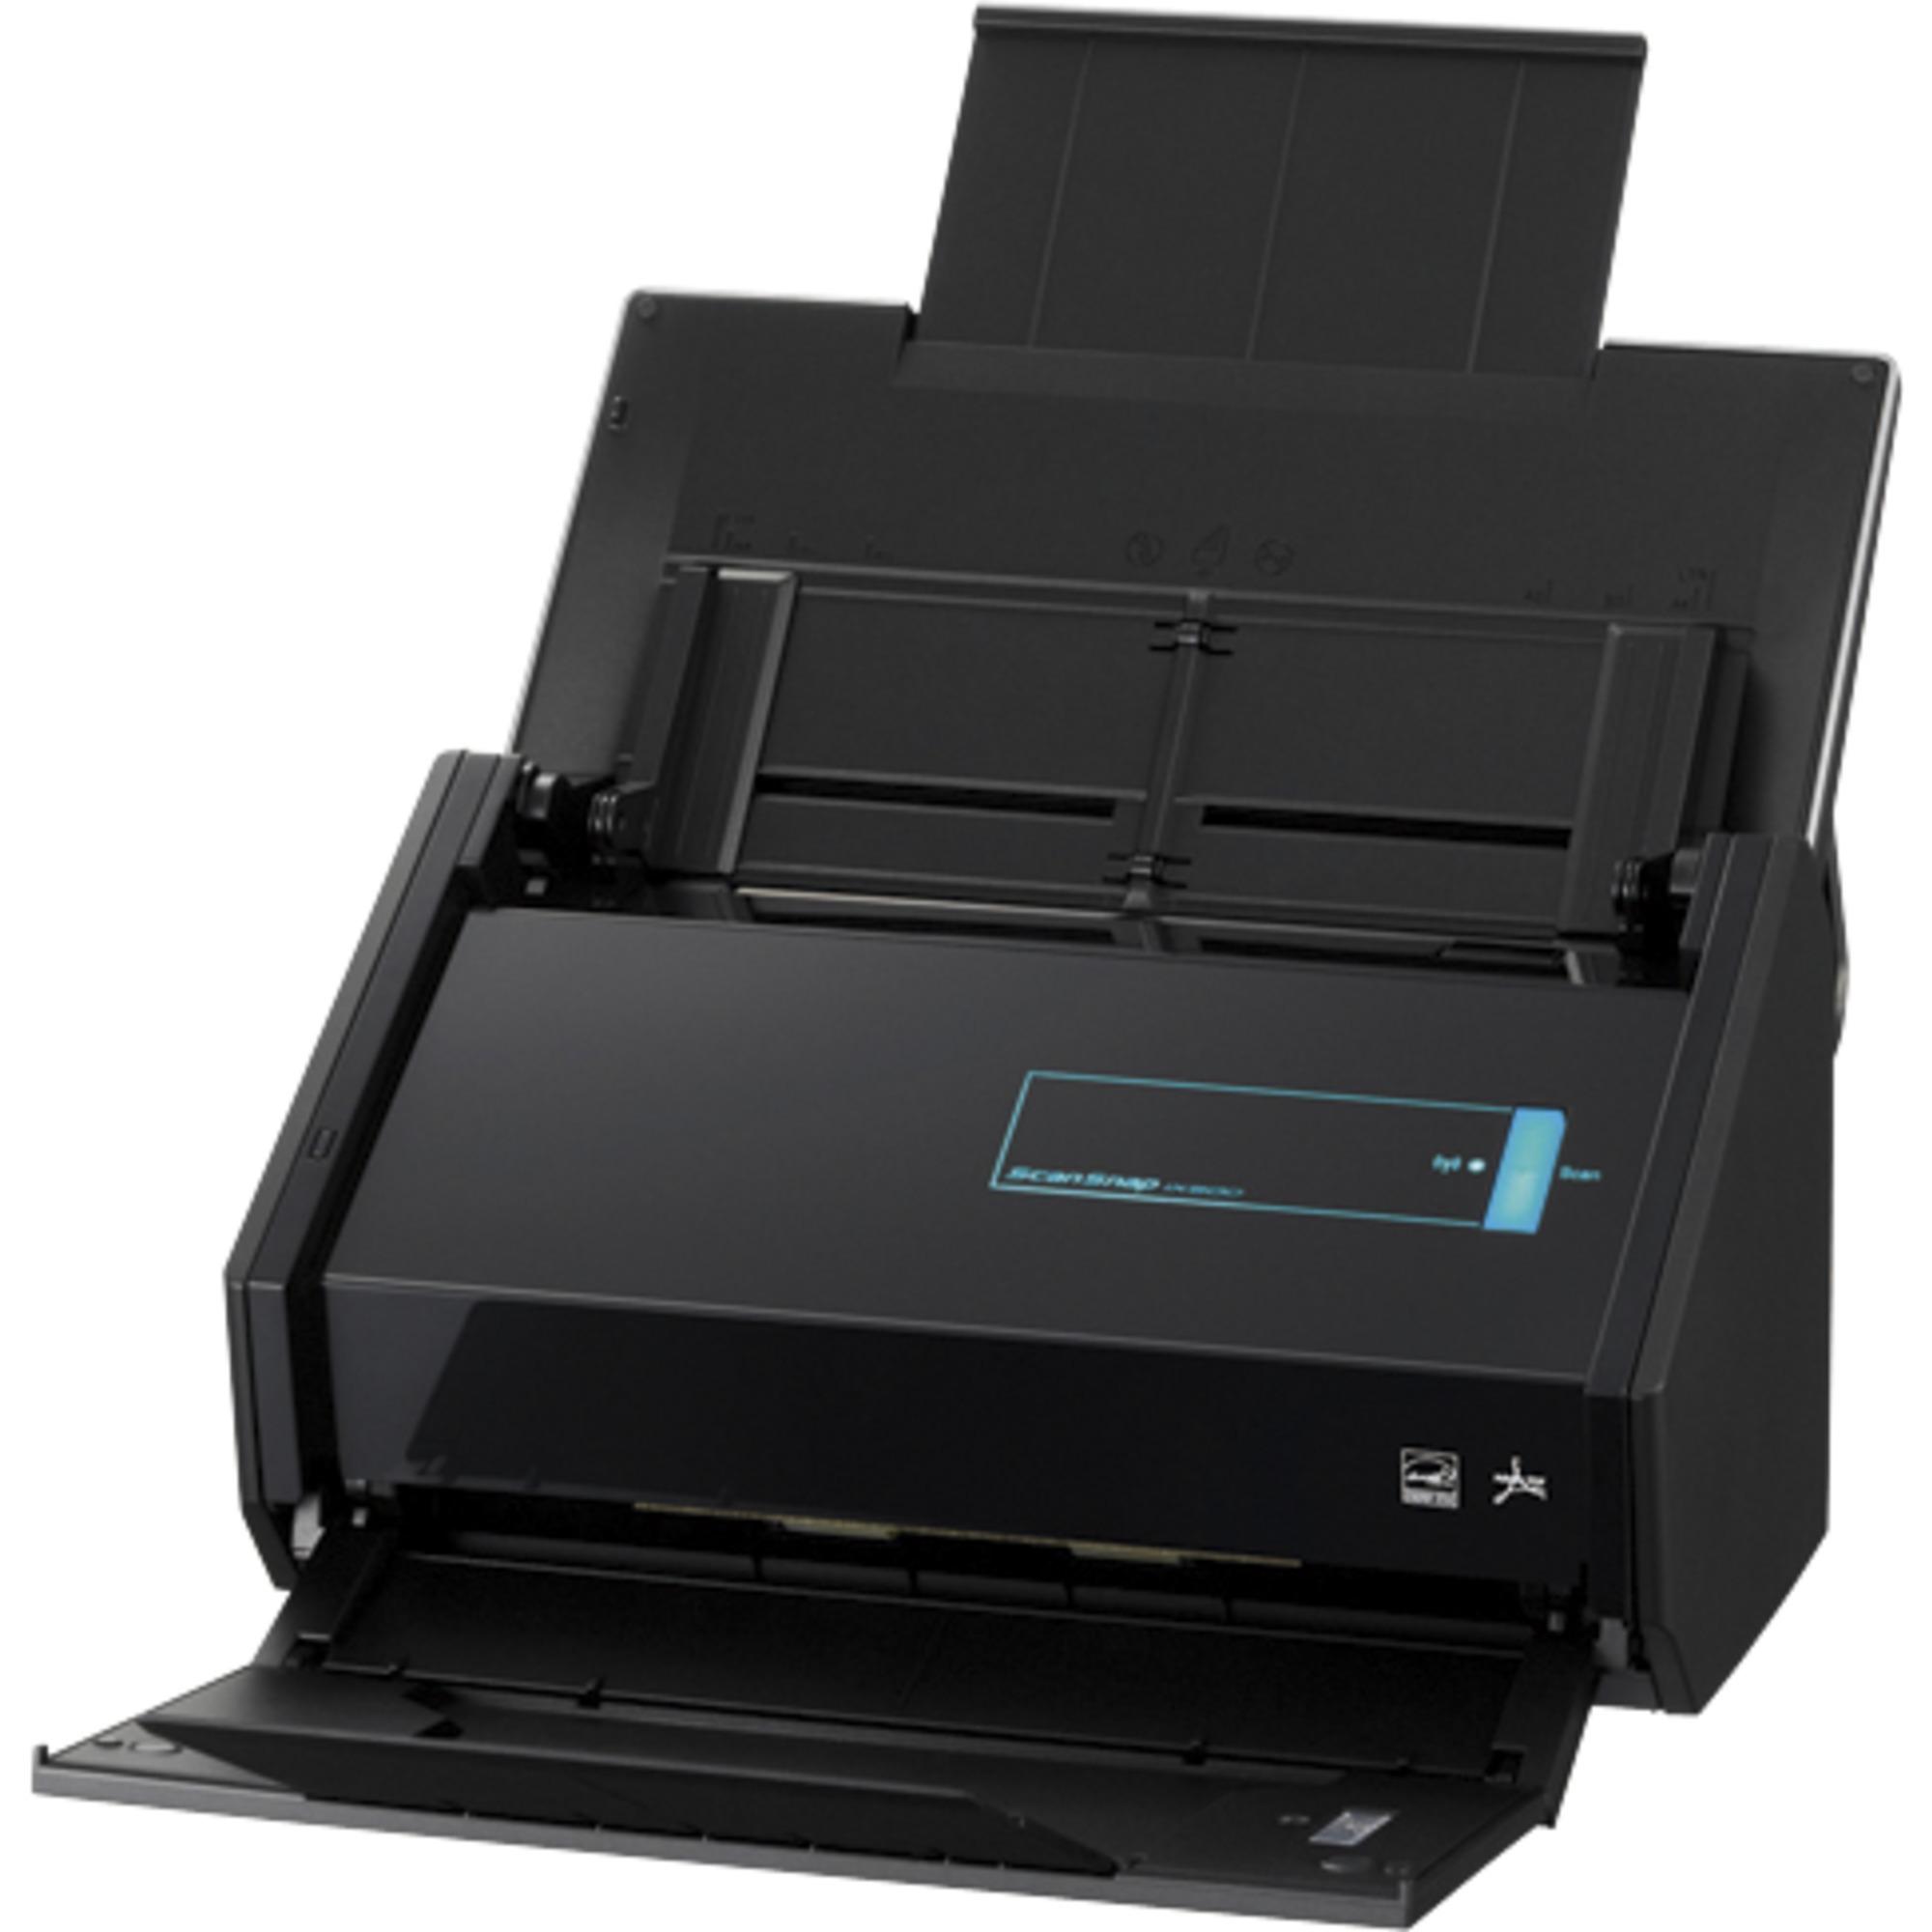 ScanSnap iX500 ADF scanner 600 x 600DPI A4 Noir